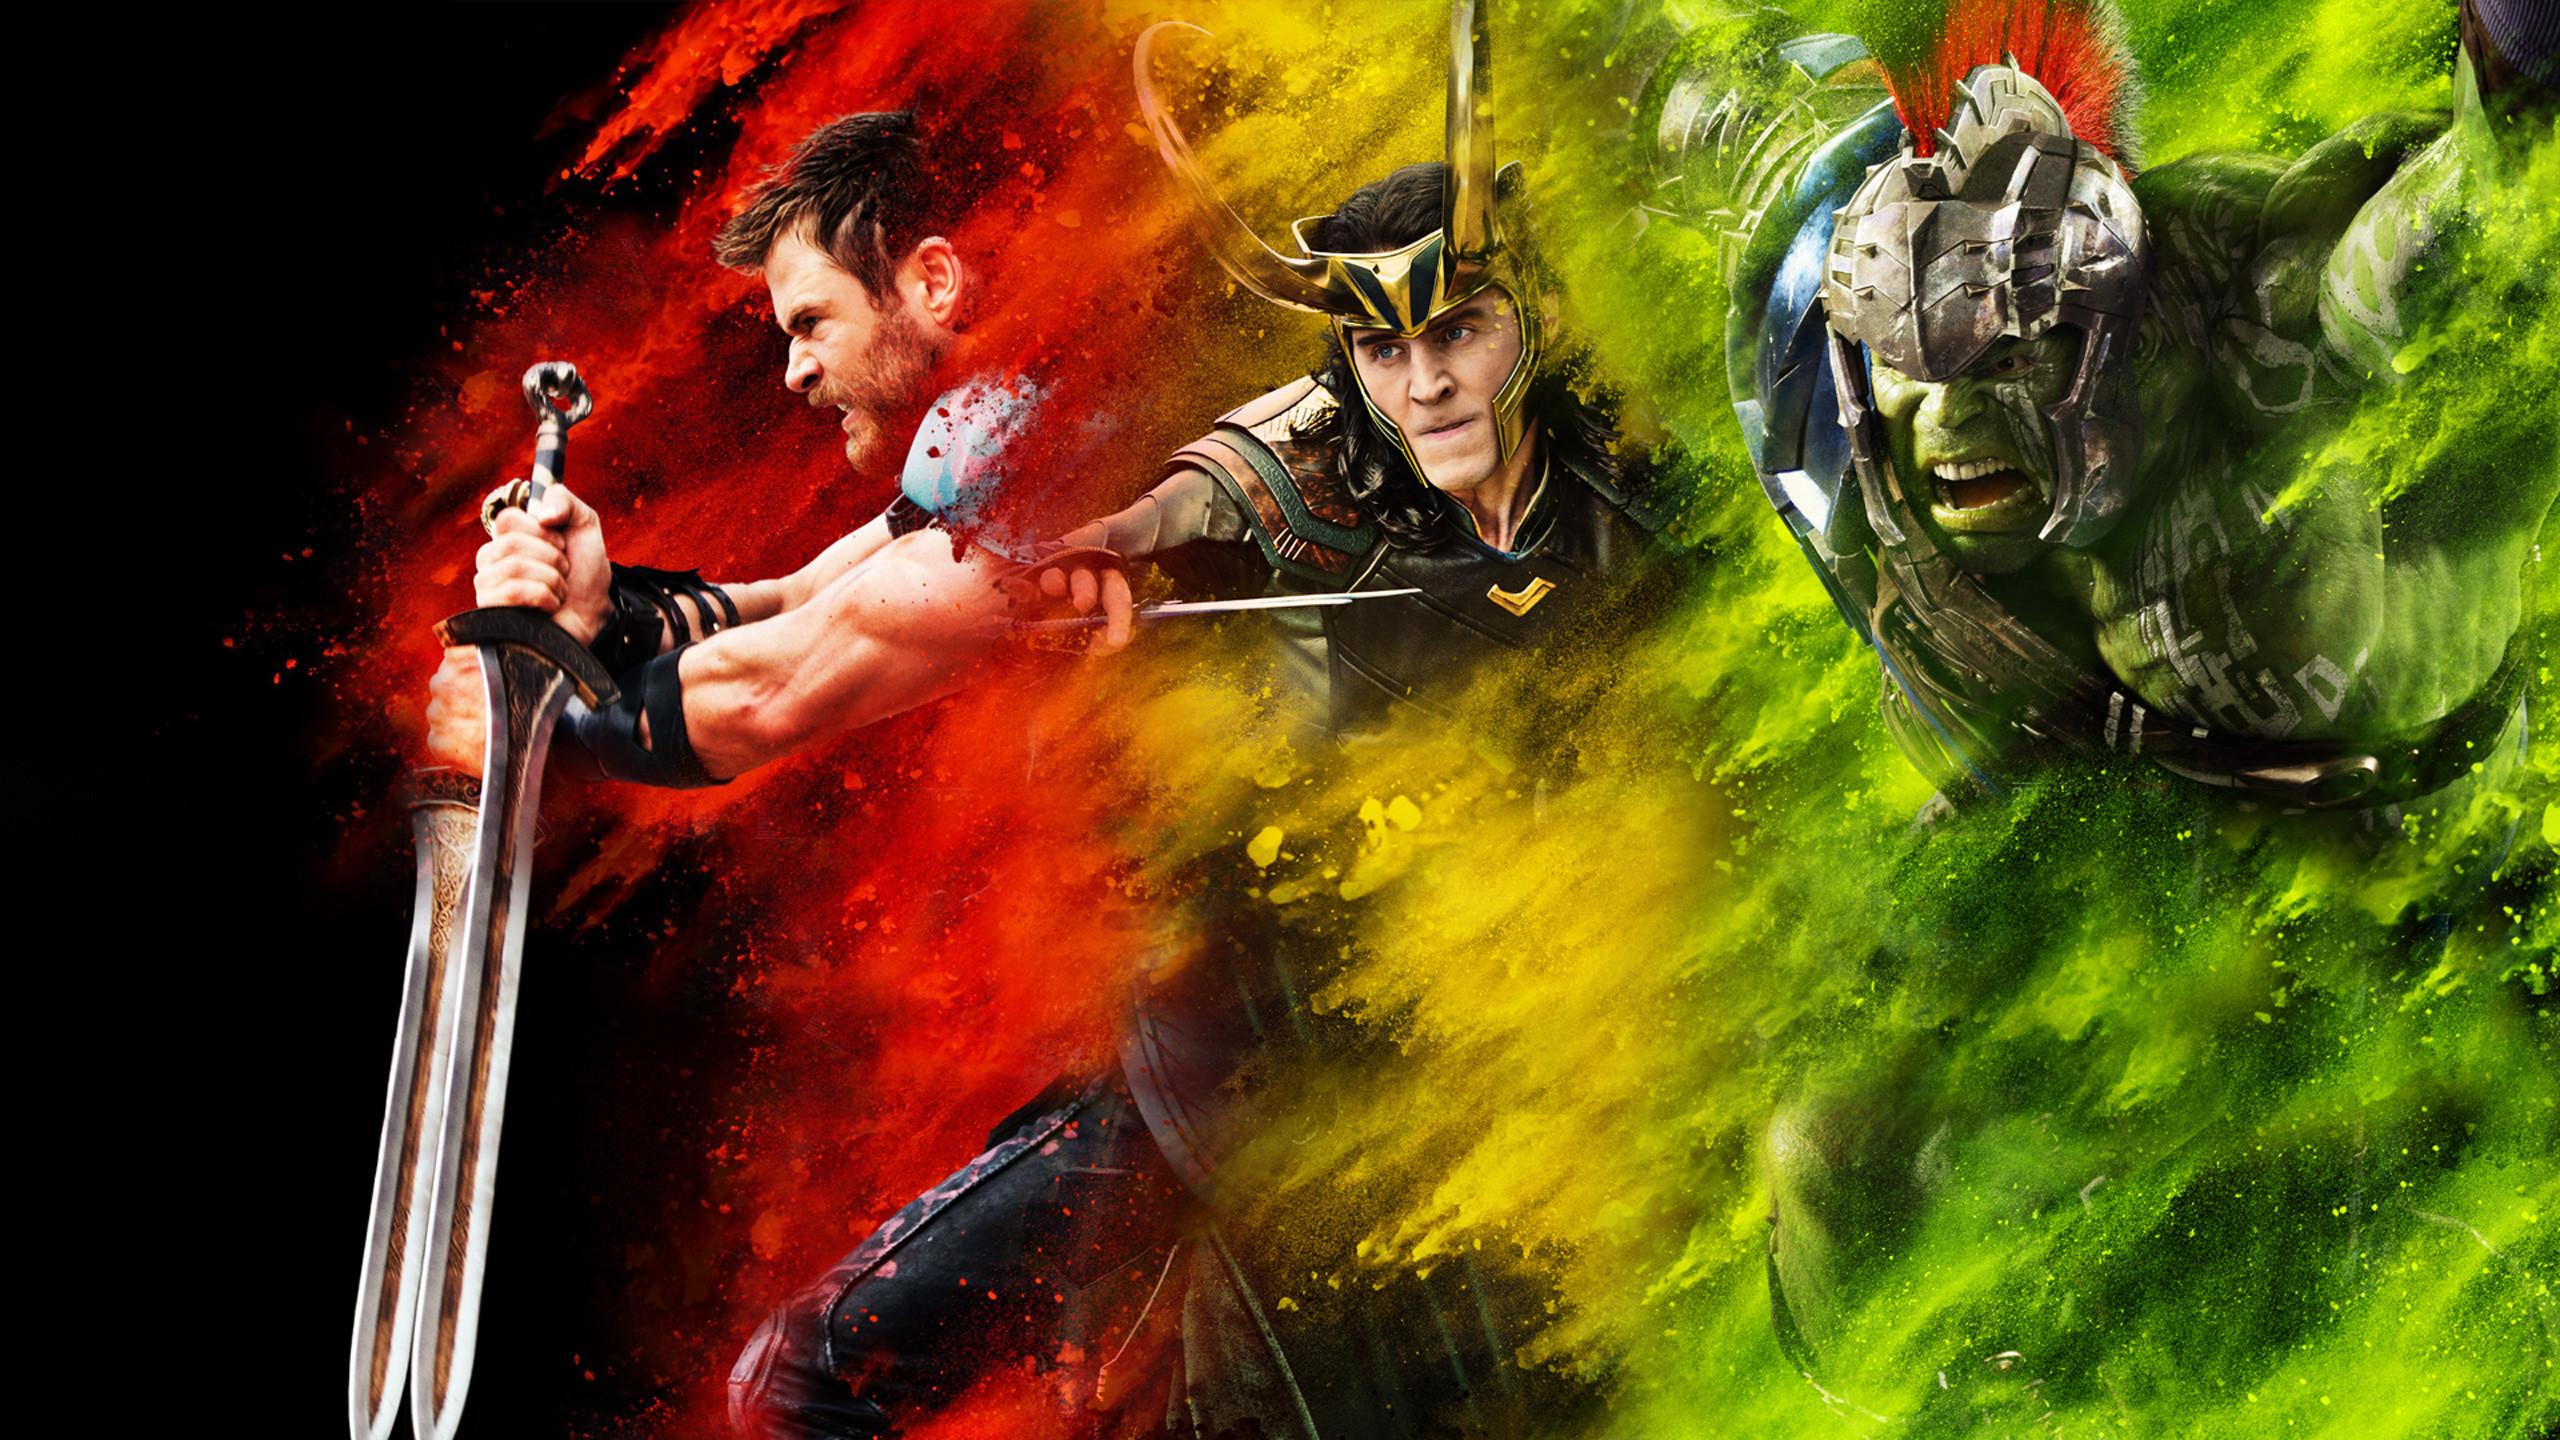 Res: 2560x1440, Filme - Thor: Ragnarok Thor Chris Hemsworth Loki Tom Hiddleston Hulk Mark  Ruffalo Wallpaper